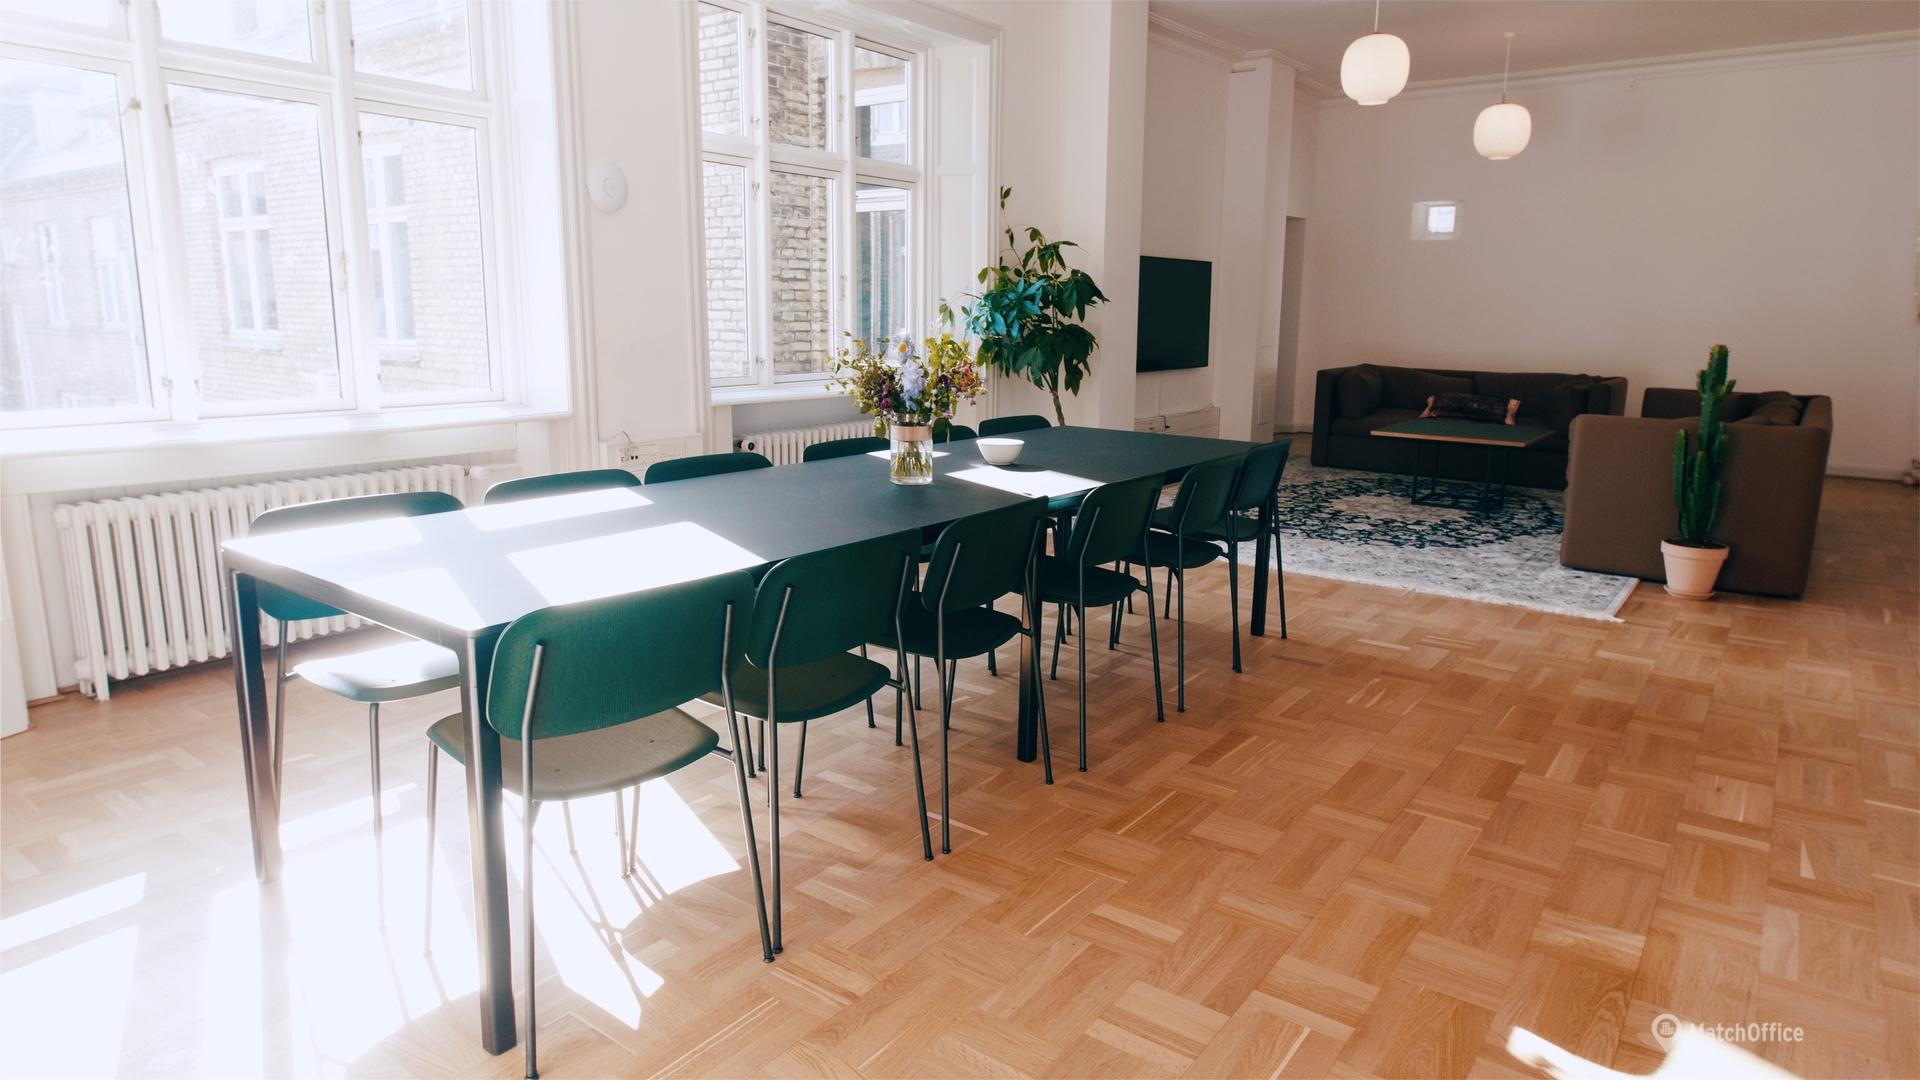 Lease Managed Office In Copenhagen V Gammel Kongevej 1 Matchoffice